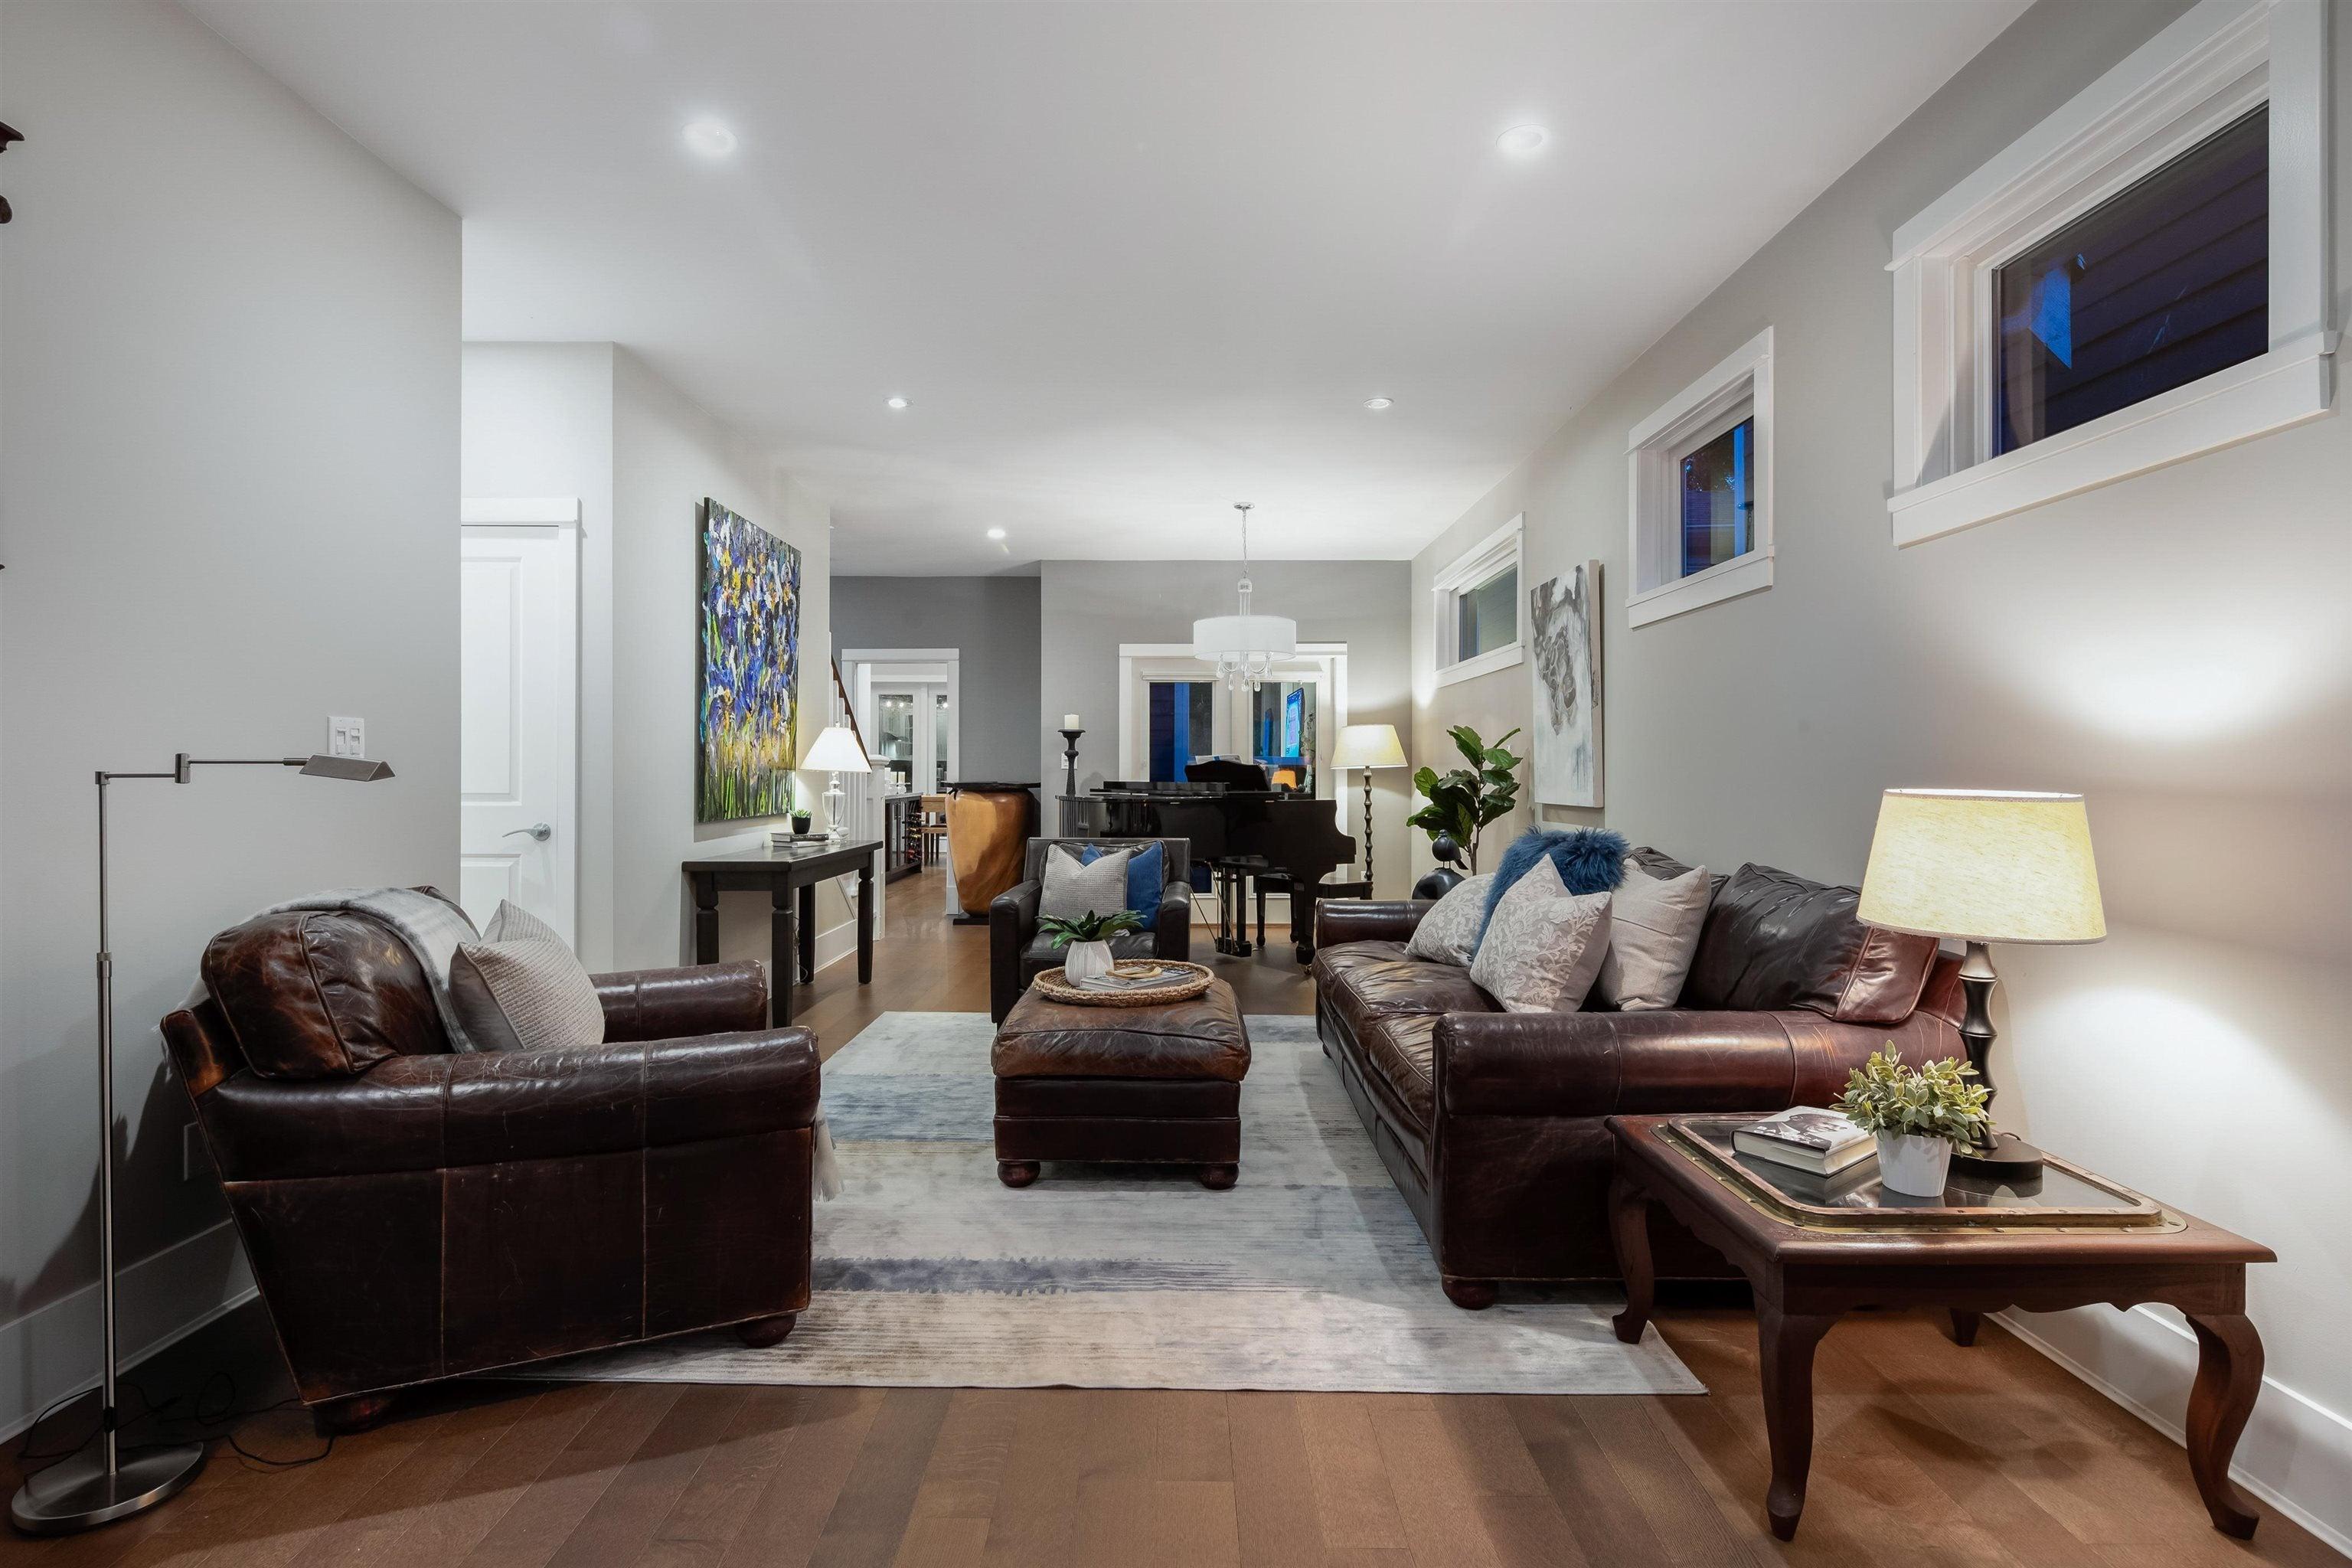 2258 WINDRIDGE DRIVE - Seymour NV House/Single Family for sale, 5 Bedrooms (R2617156) - #19